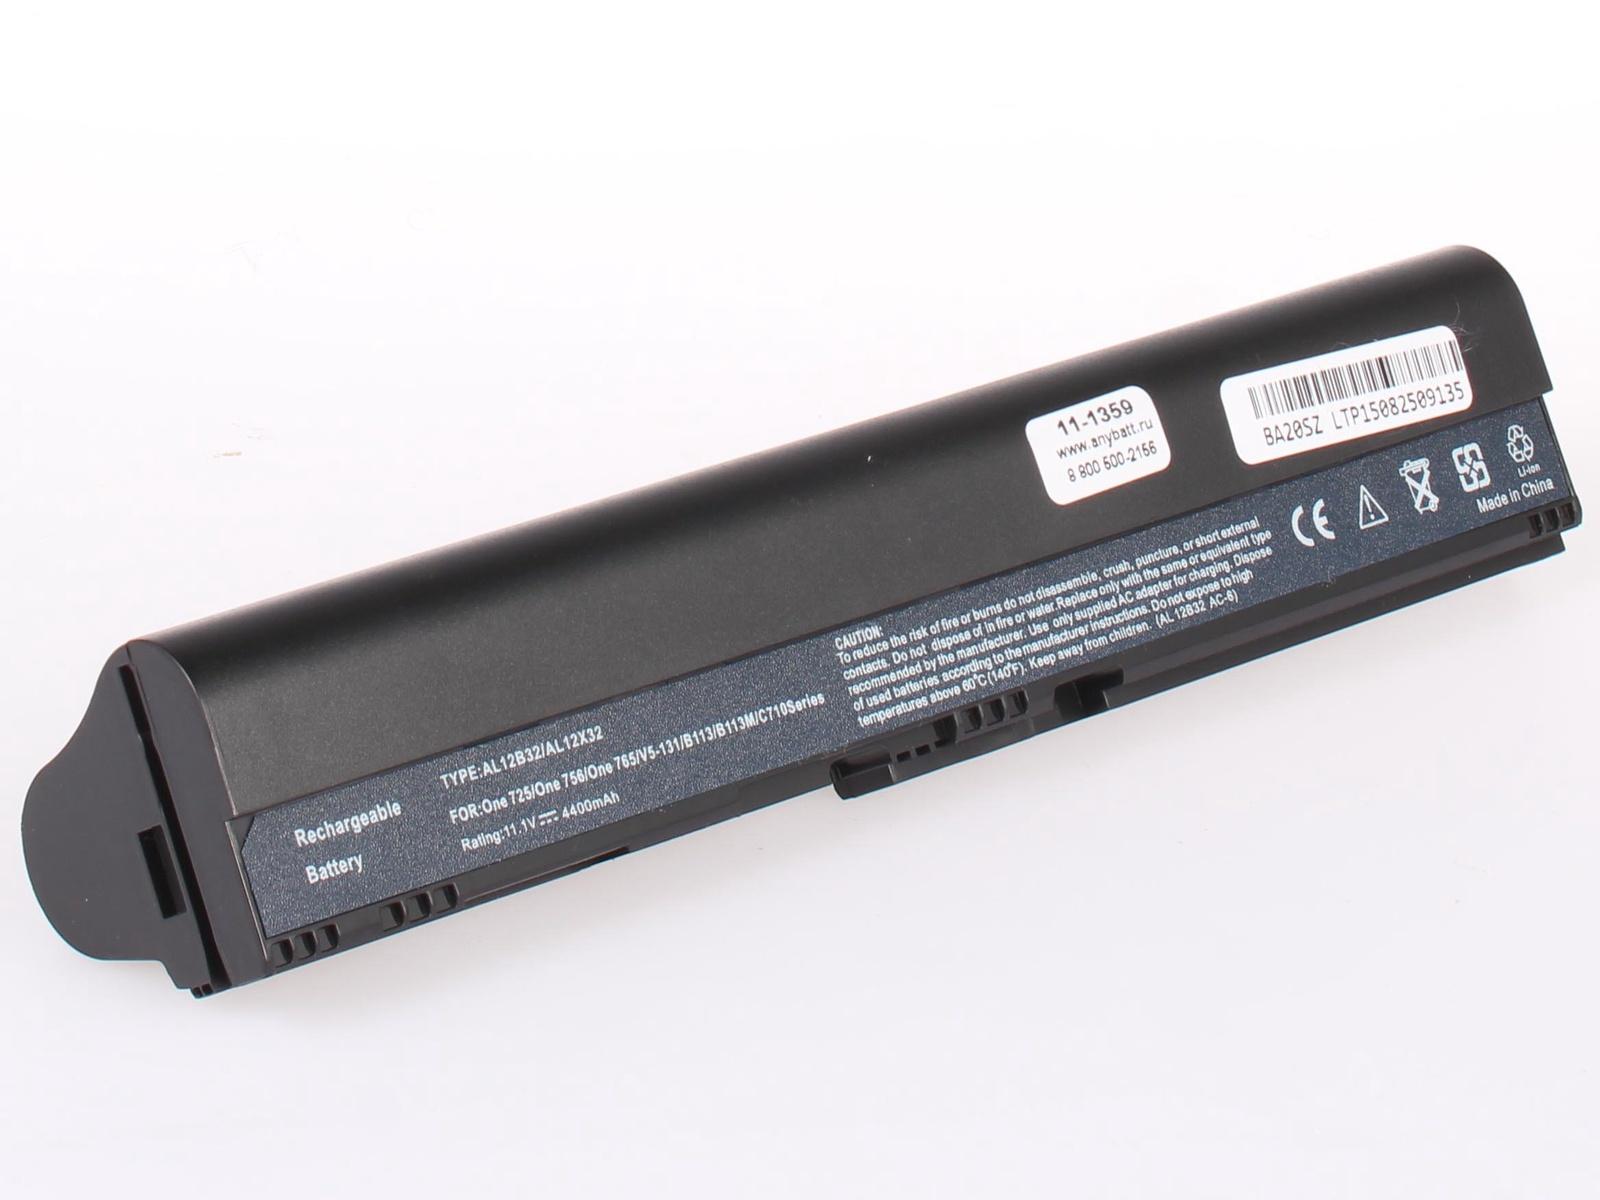 Аккумулятор для ноутбука AnyBatt для Acer Aspire One 725-C6CKK, Aspire V5-131-10172G32NKK, TravelMate TMB113, Aspire V5-122P-42154G50nss, Aspire V5-122P-61454G50NSS, Aspire V5-171-33214G50ass, Aspire V5-122P-61454G50nbb